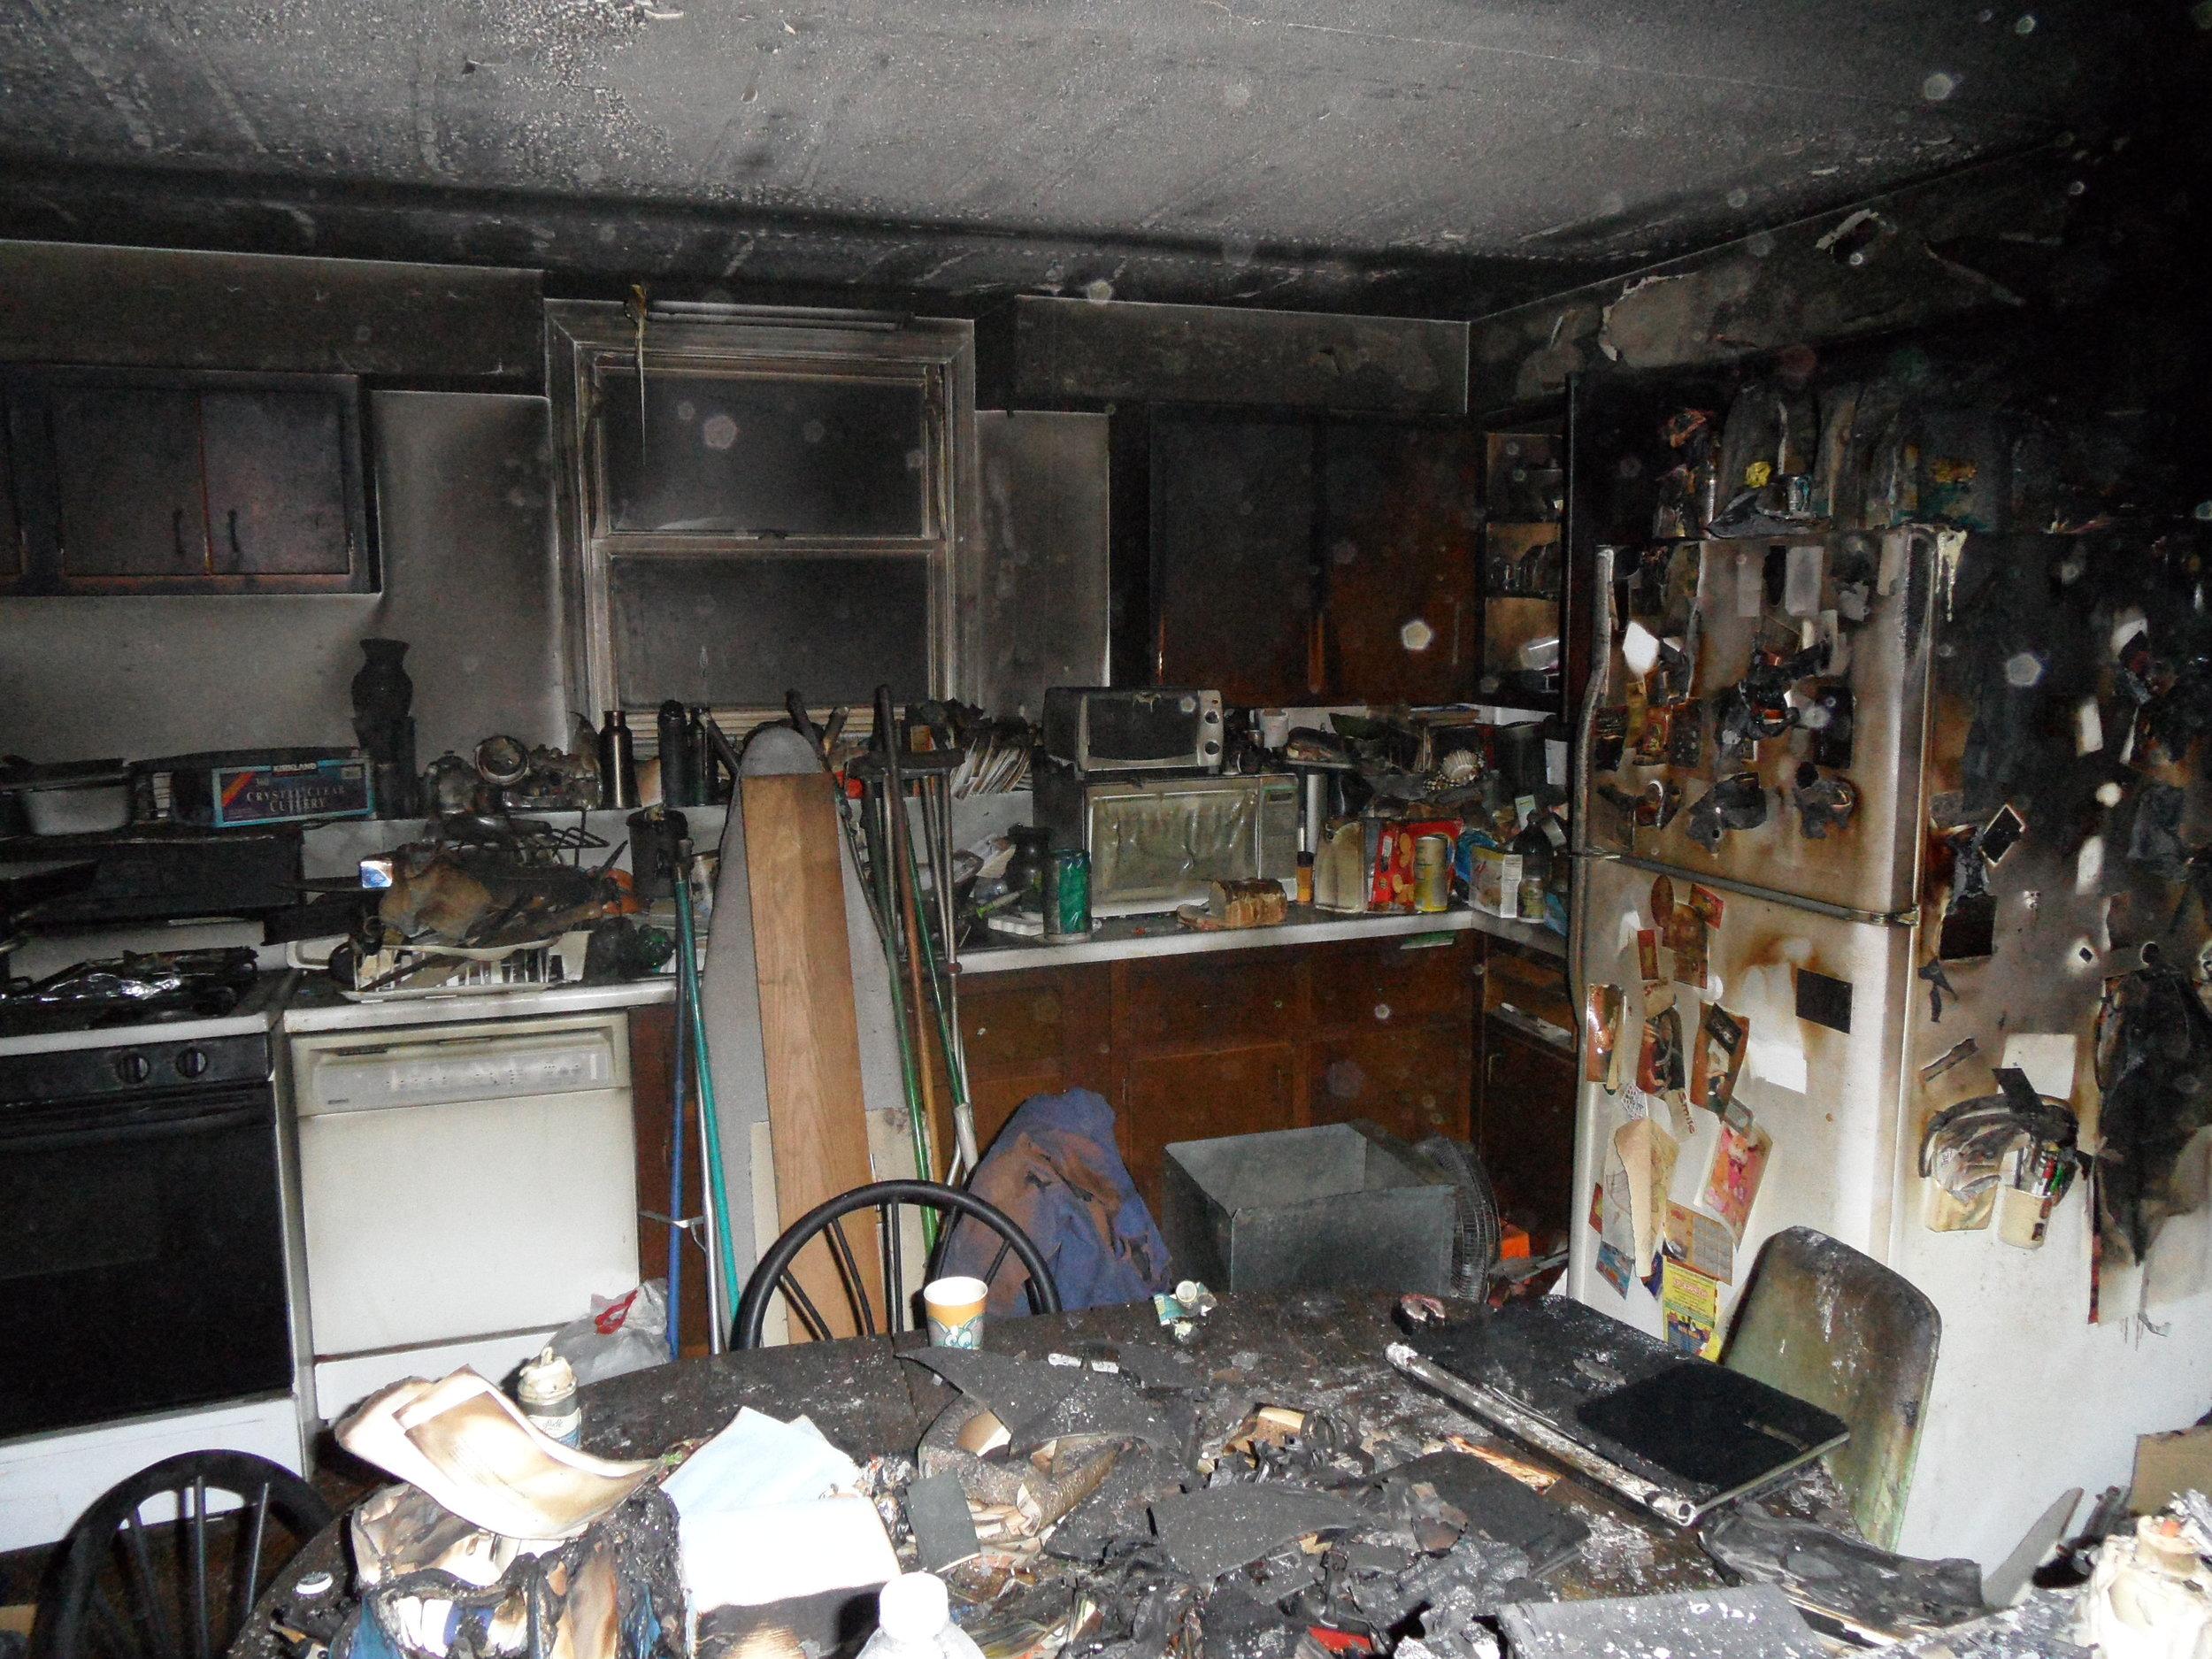 burned kitchen